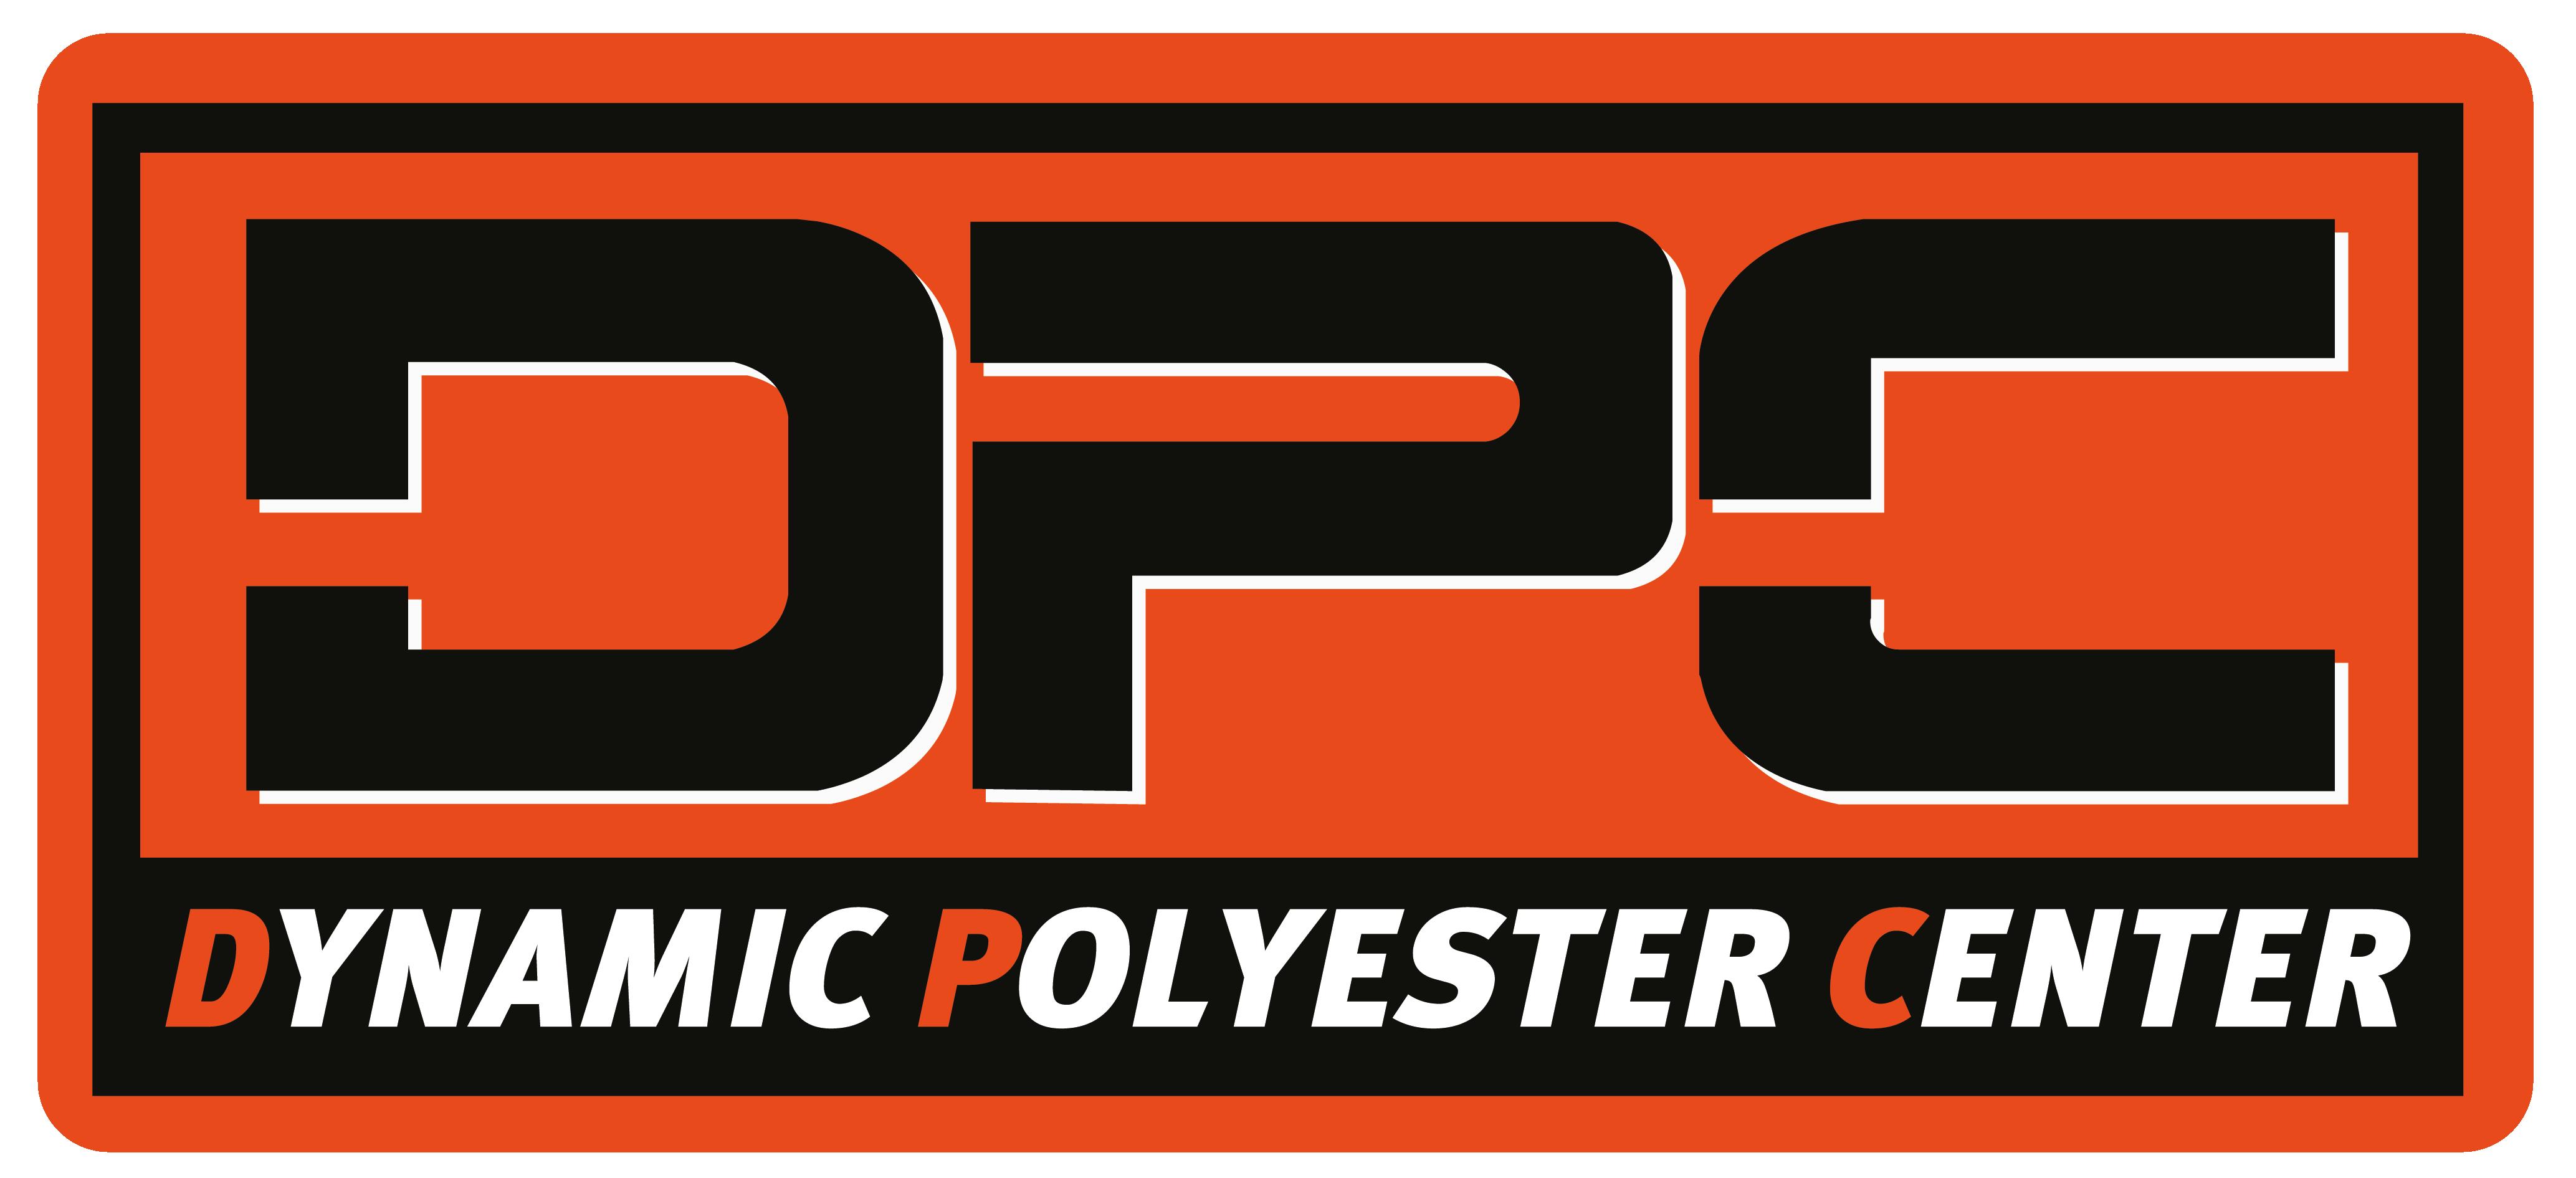 Dynamic Polyester Center